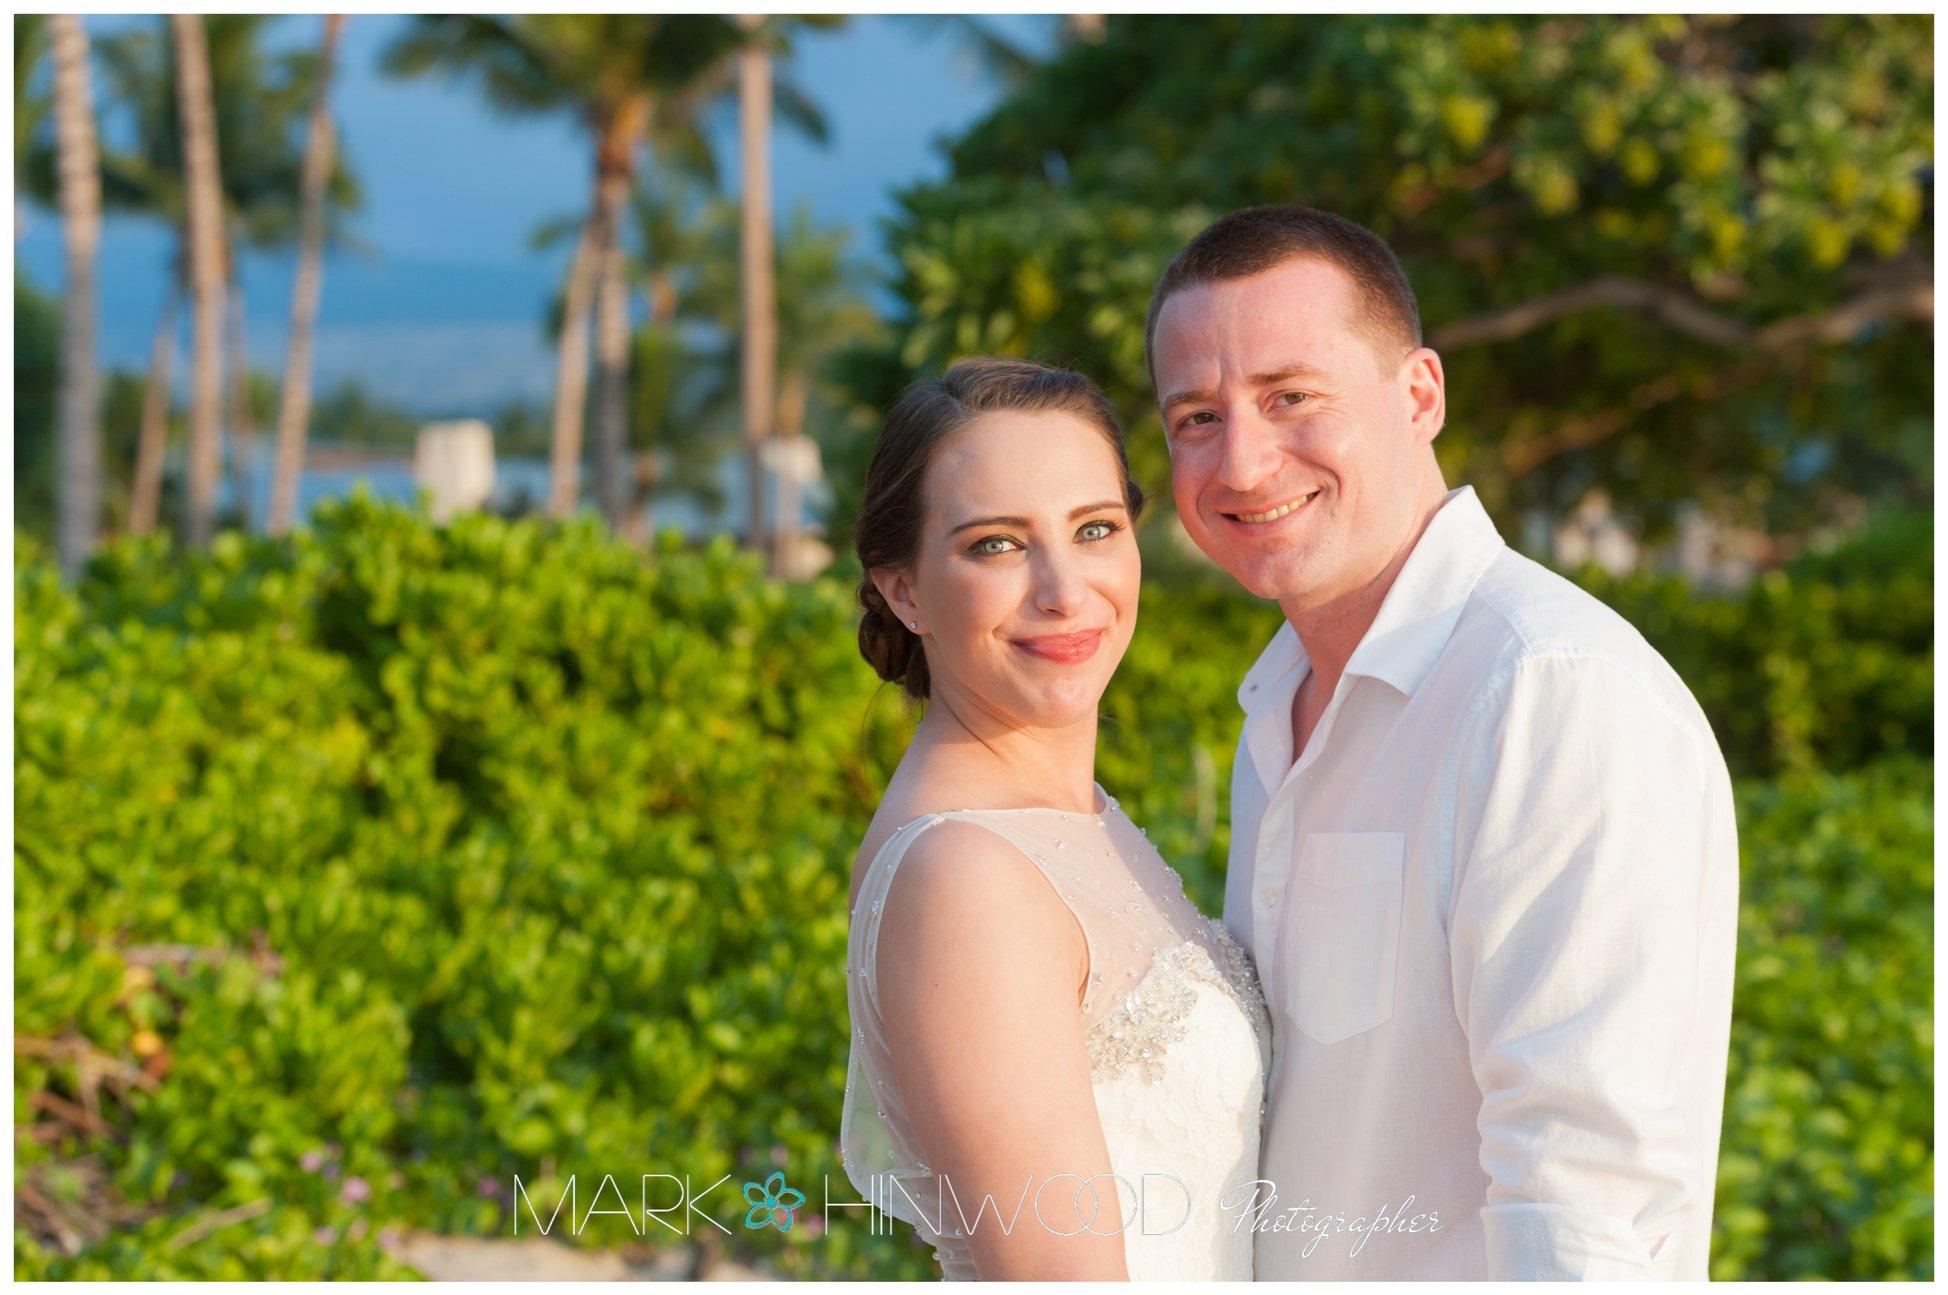 Top Kailua Kona Photographers 20